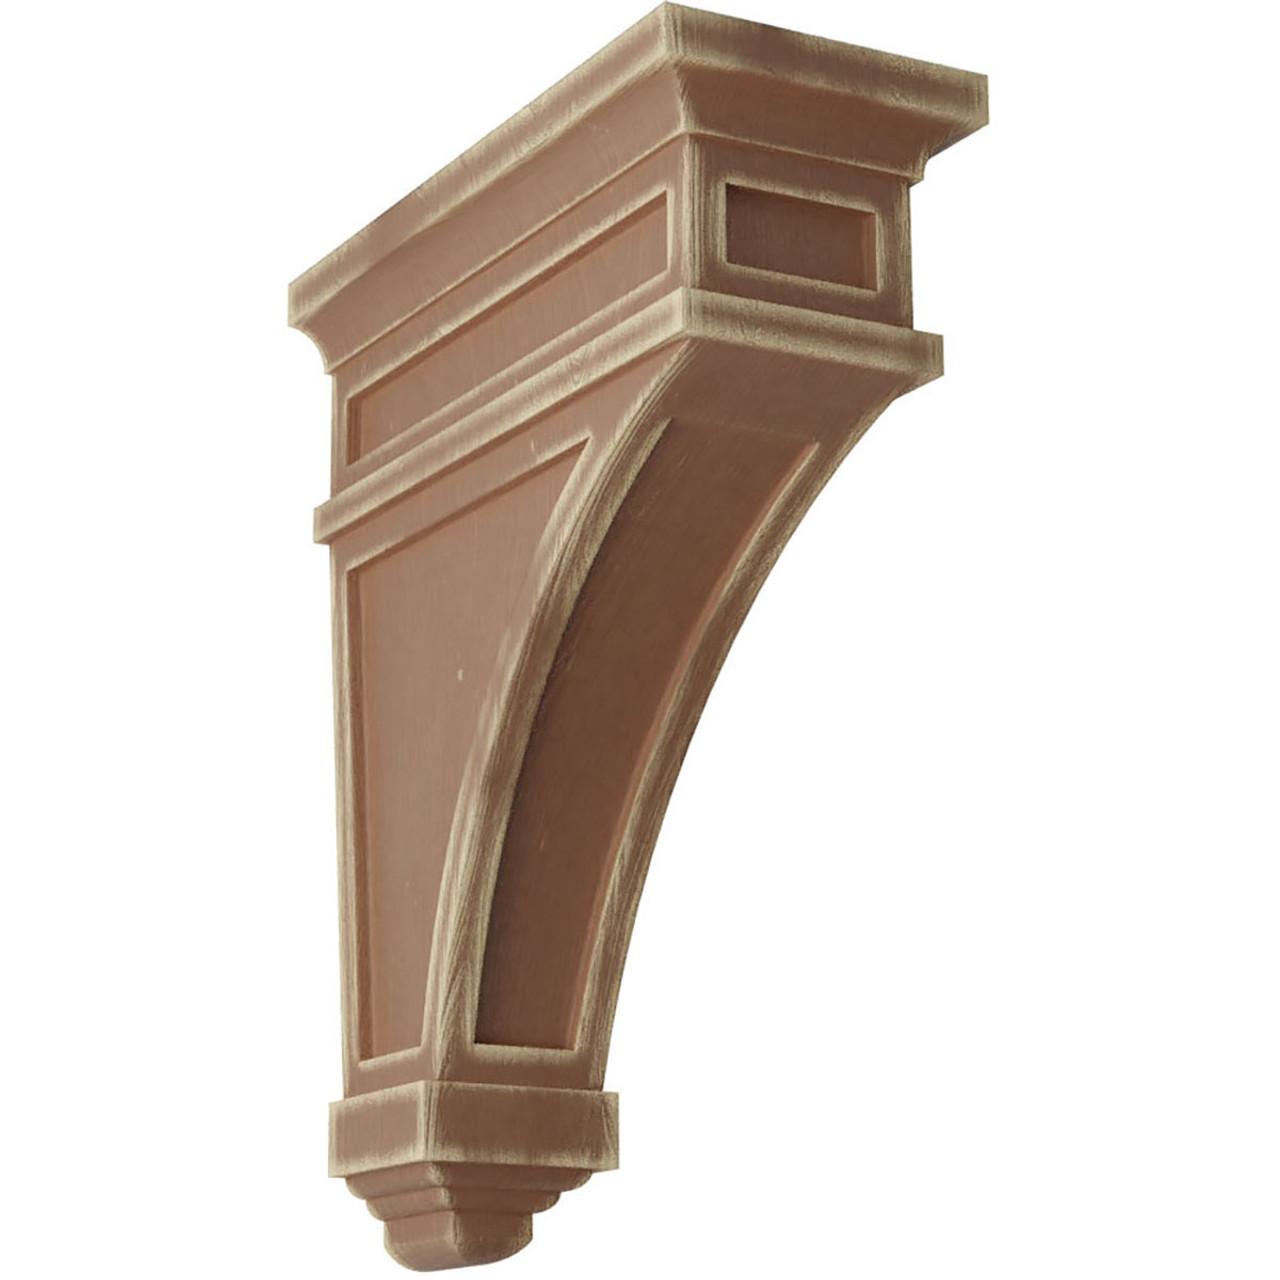 "4""W x 4""D x 12""H Arts and Crafts Wood Vintage Decor Corbel Vintage Brown"